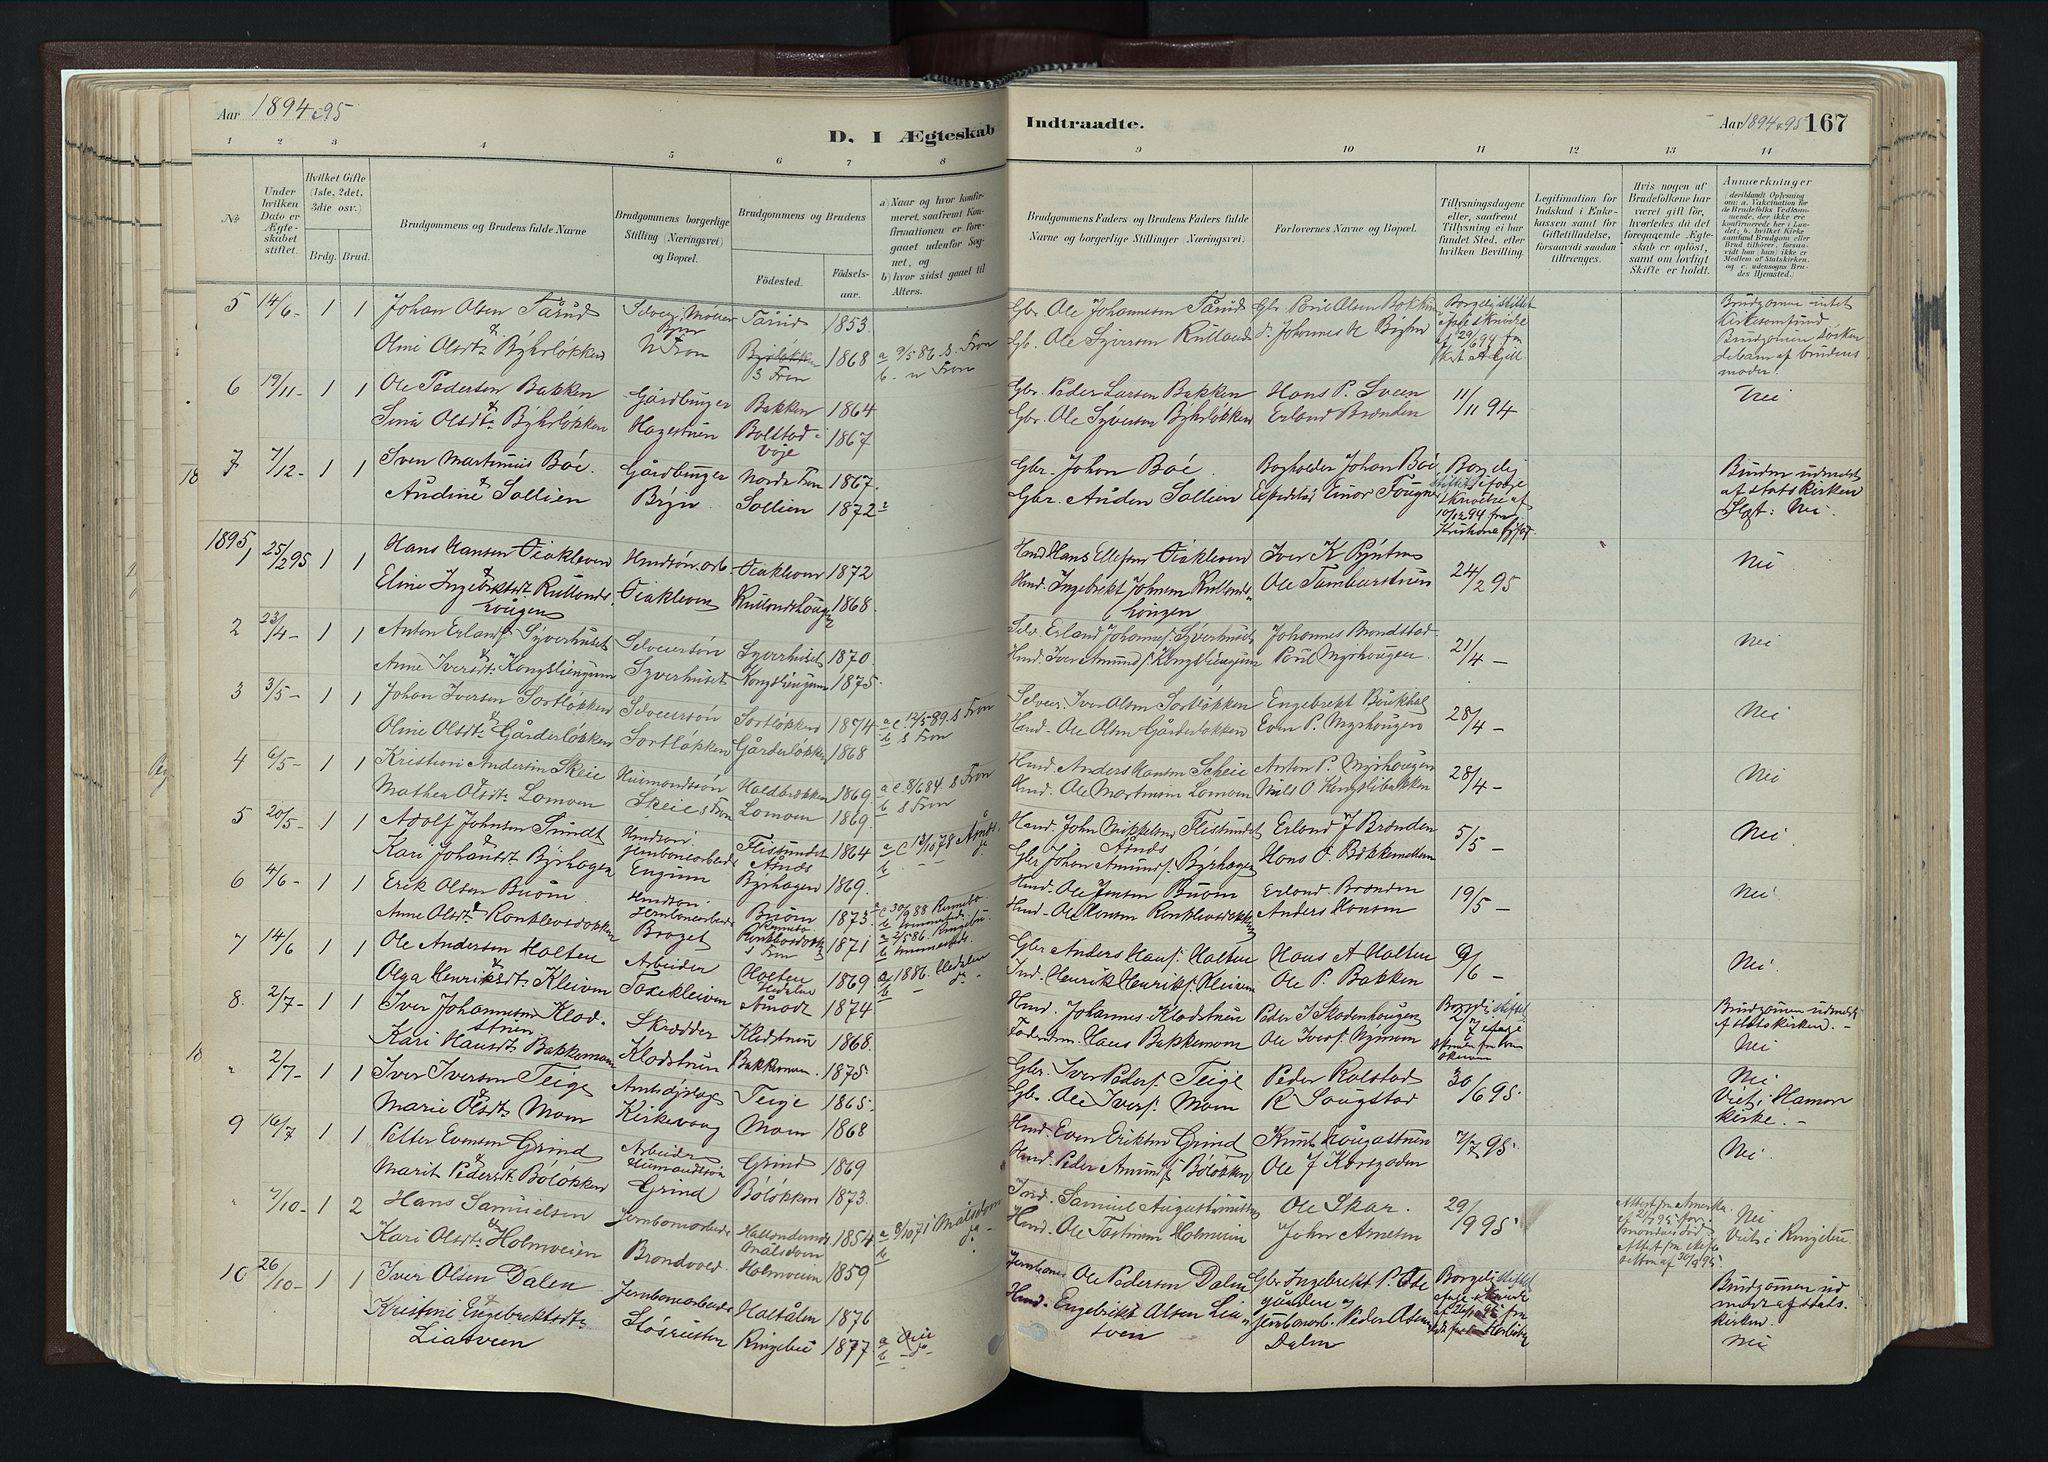 SAH, Nord-Fron prestekontor, Ministerialbok nr. 4, 1884-1914, s. 167